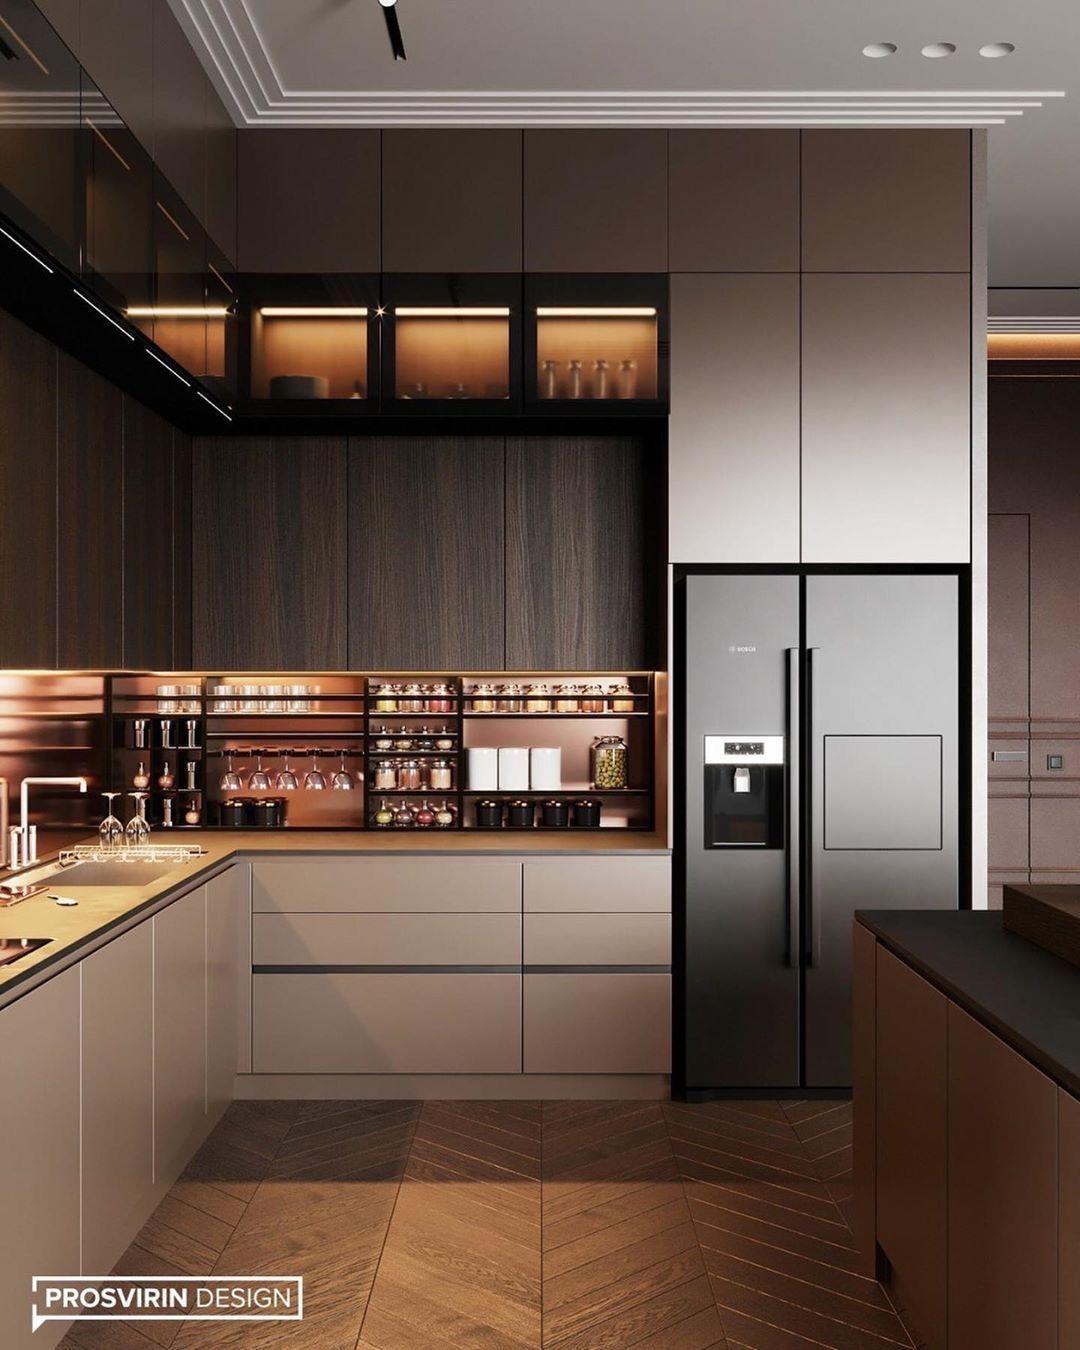 Pin By Pedini Miami On Tiles White Modern Kitchen Kitchen Door Designs Minimalist Kitchen Cabinets